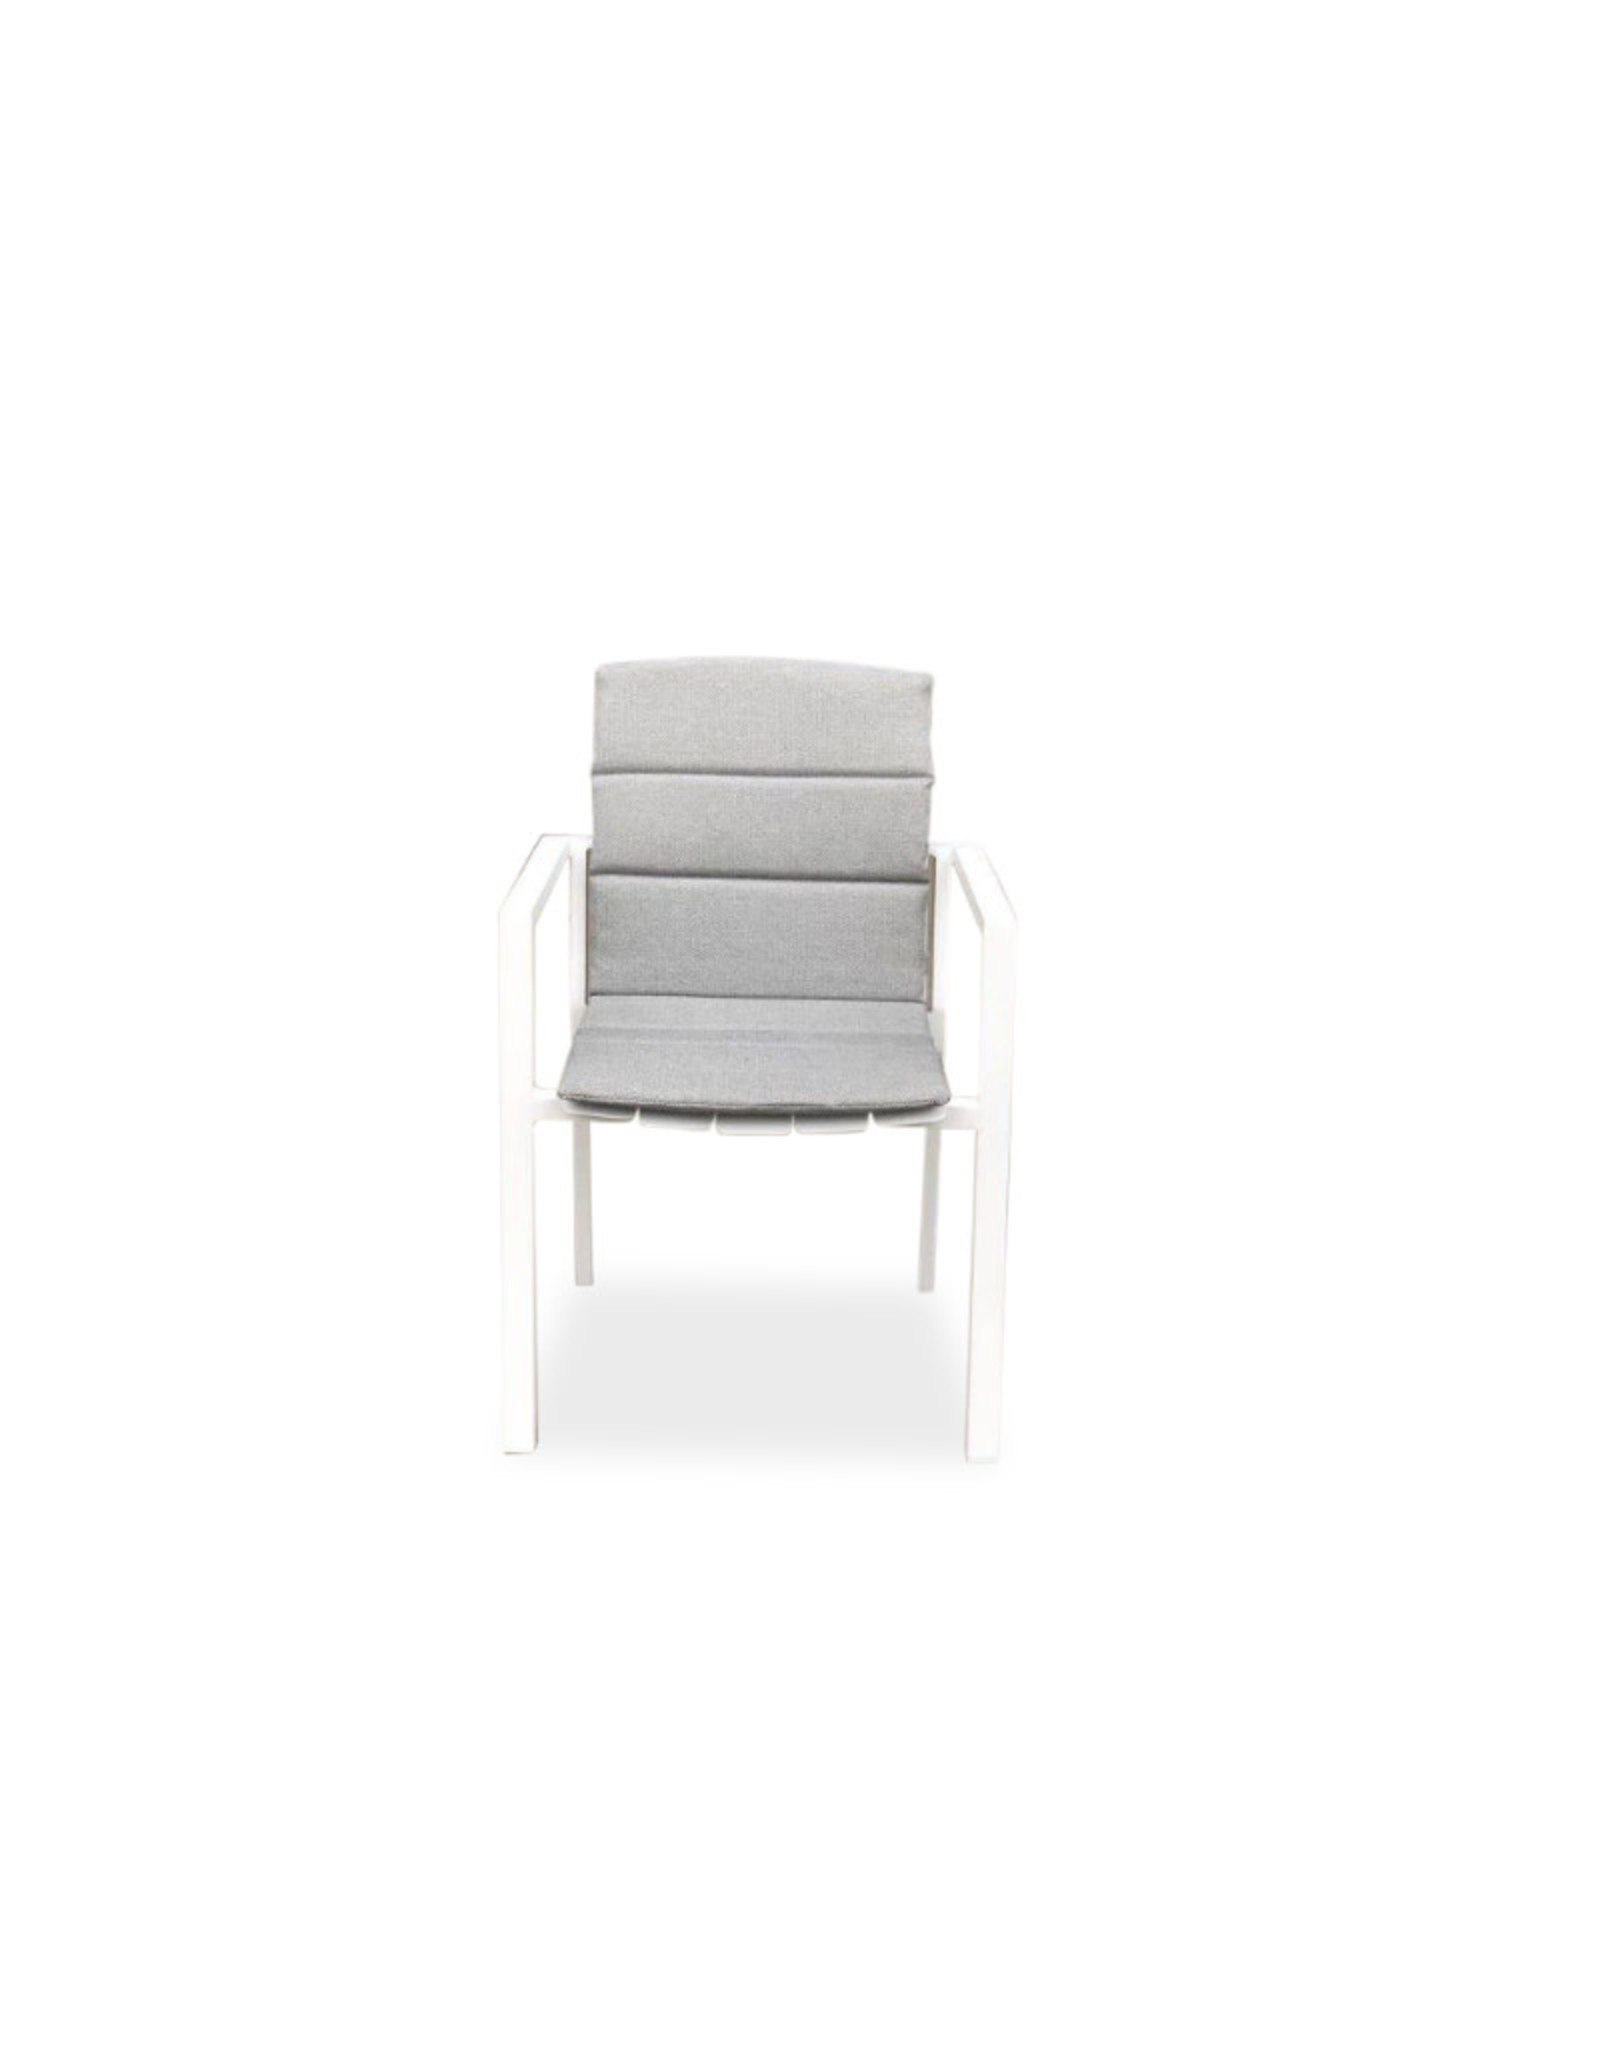 Hamilton Bay OUTDOOR Hamilton Bay Cosmo armstoel full aluminium Wit + vochtwerend kussen light grey